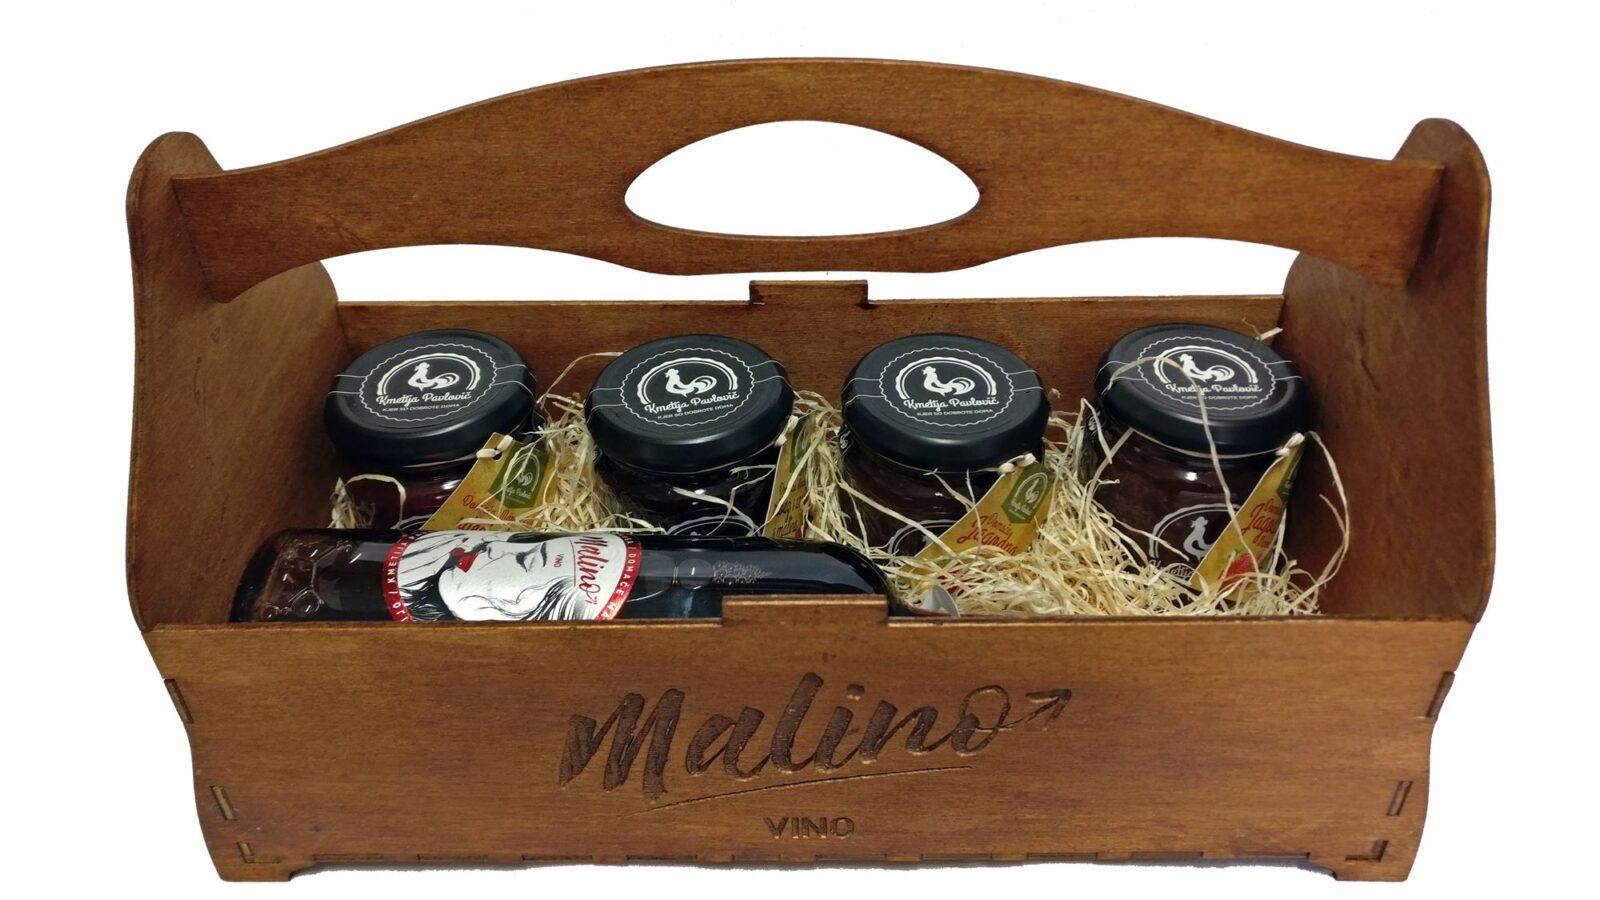 Malino LUX vino z kompletom marmelad leseni embalaži